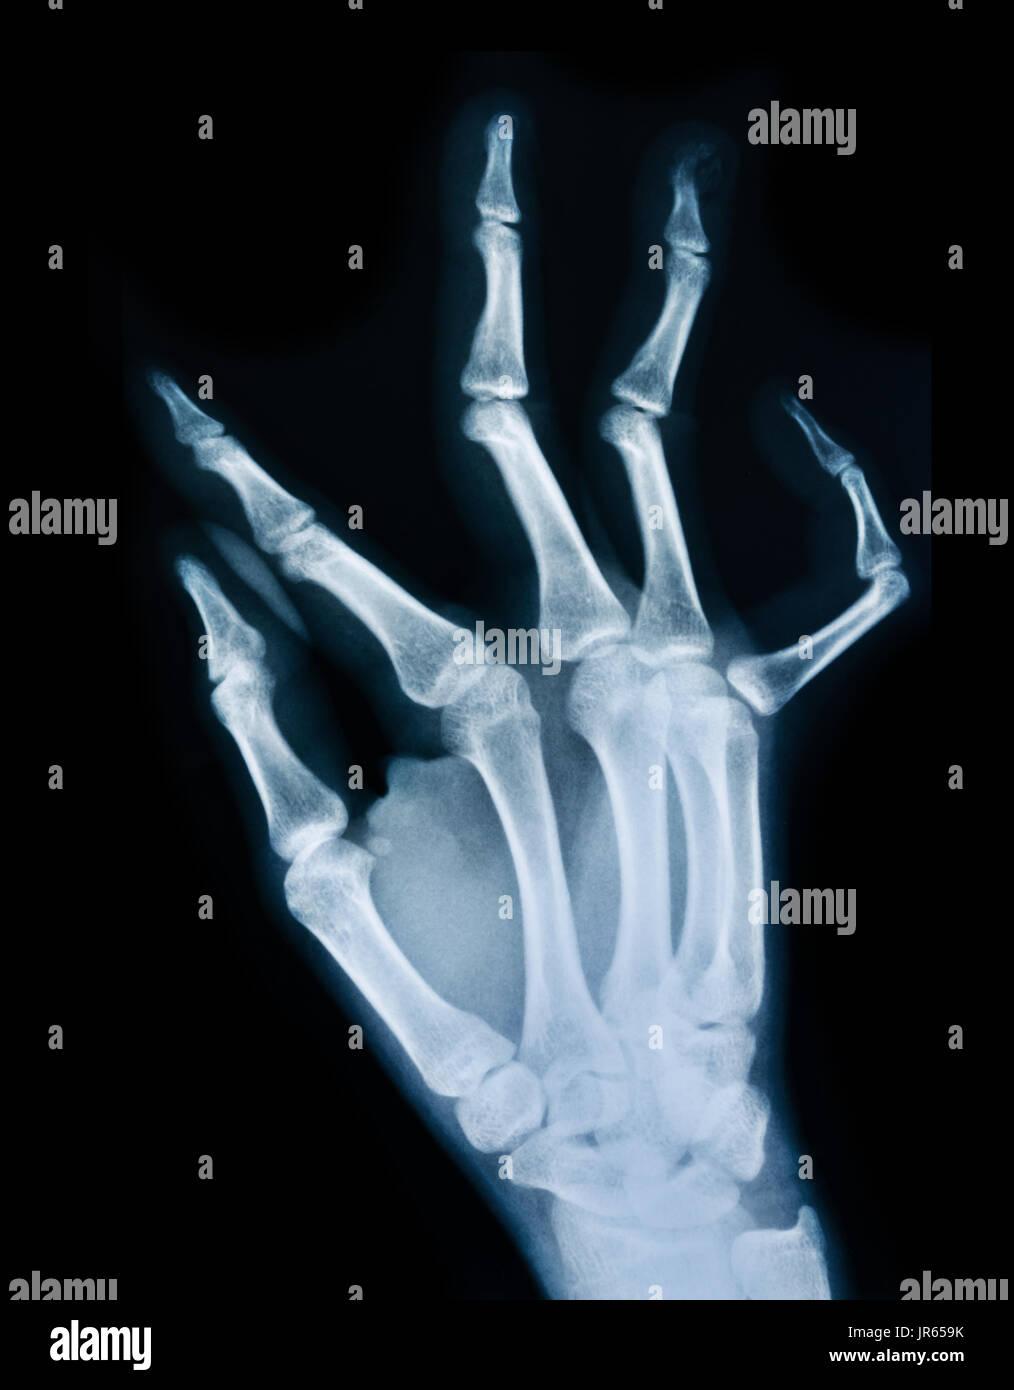 Human Wrist Anatomy Xray View Stock Photos Human Wrist Anatomy